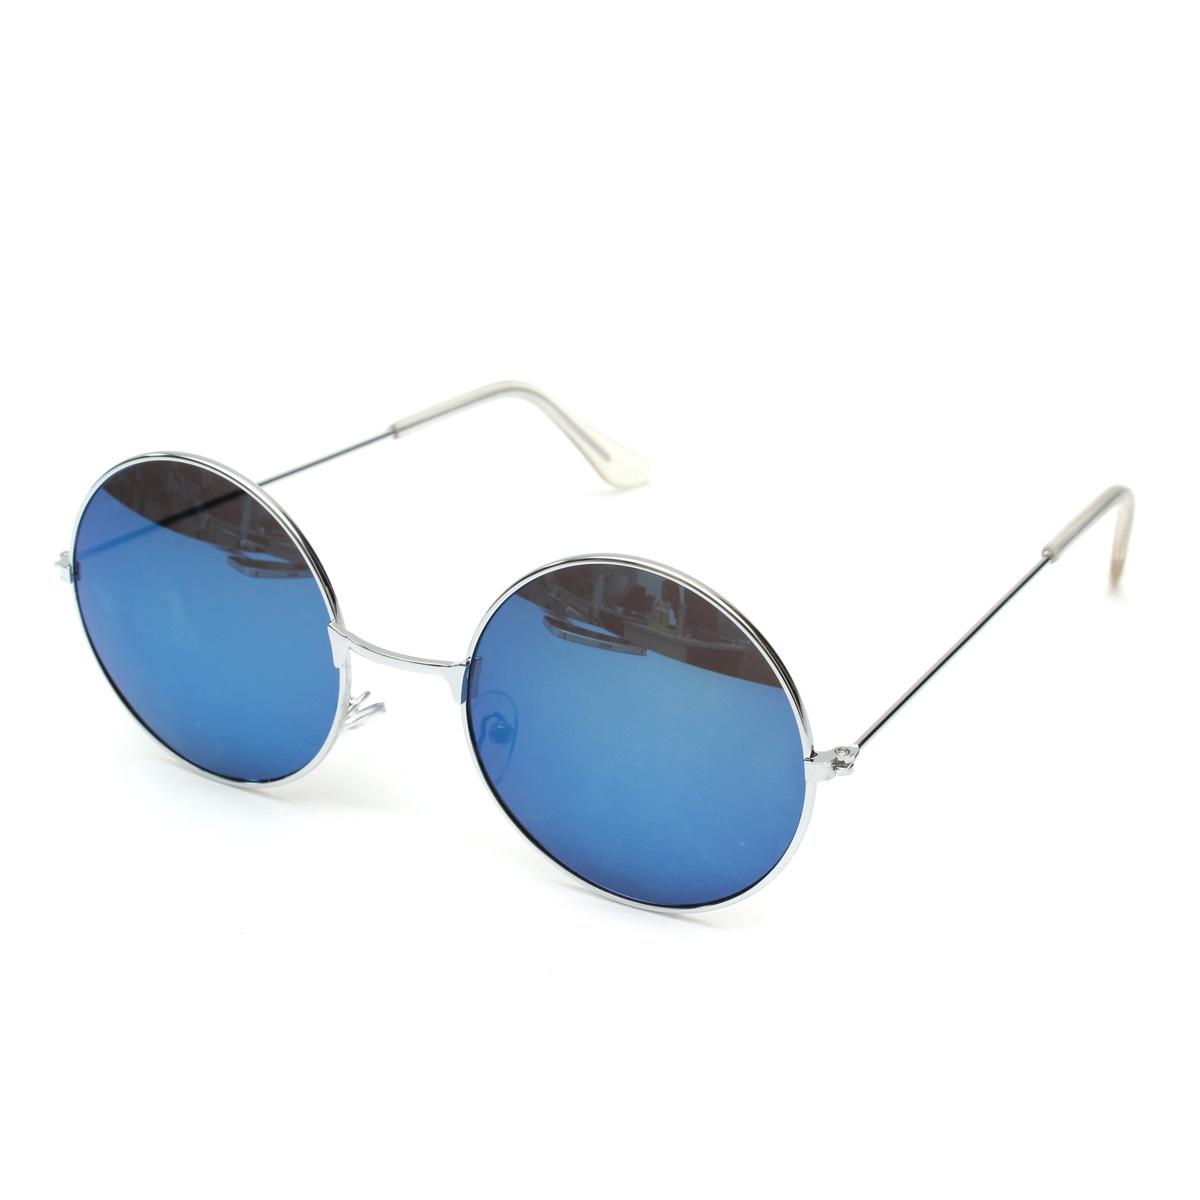 Unisex Vintage Retro Round Metal Frame Sunglasses Glasses Eyewear for Men Women